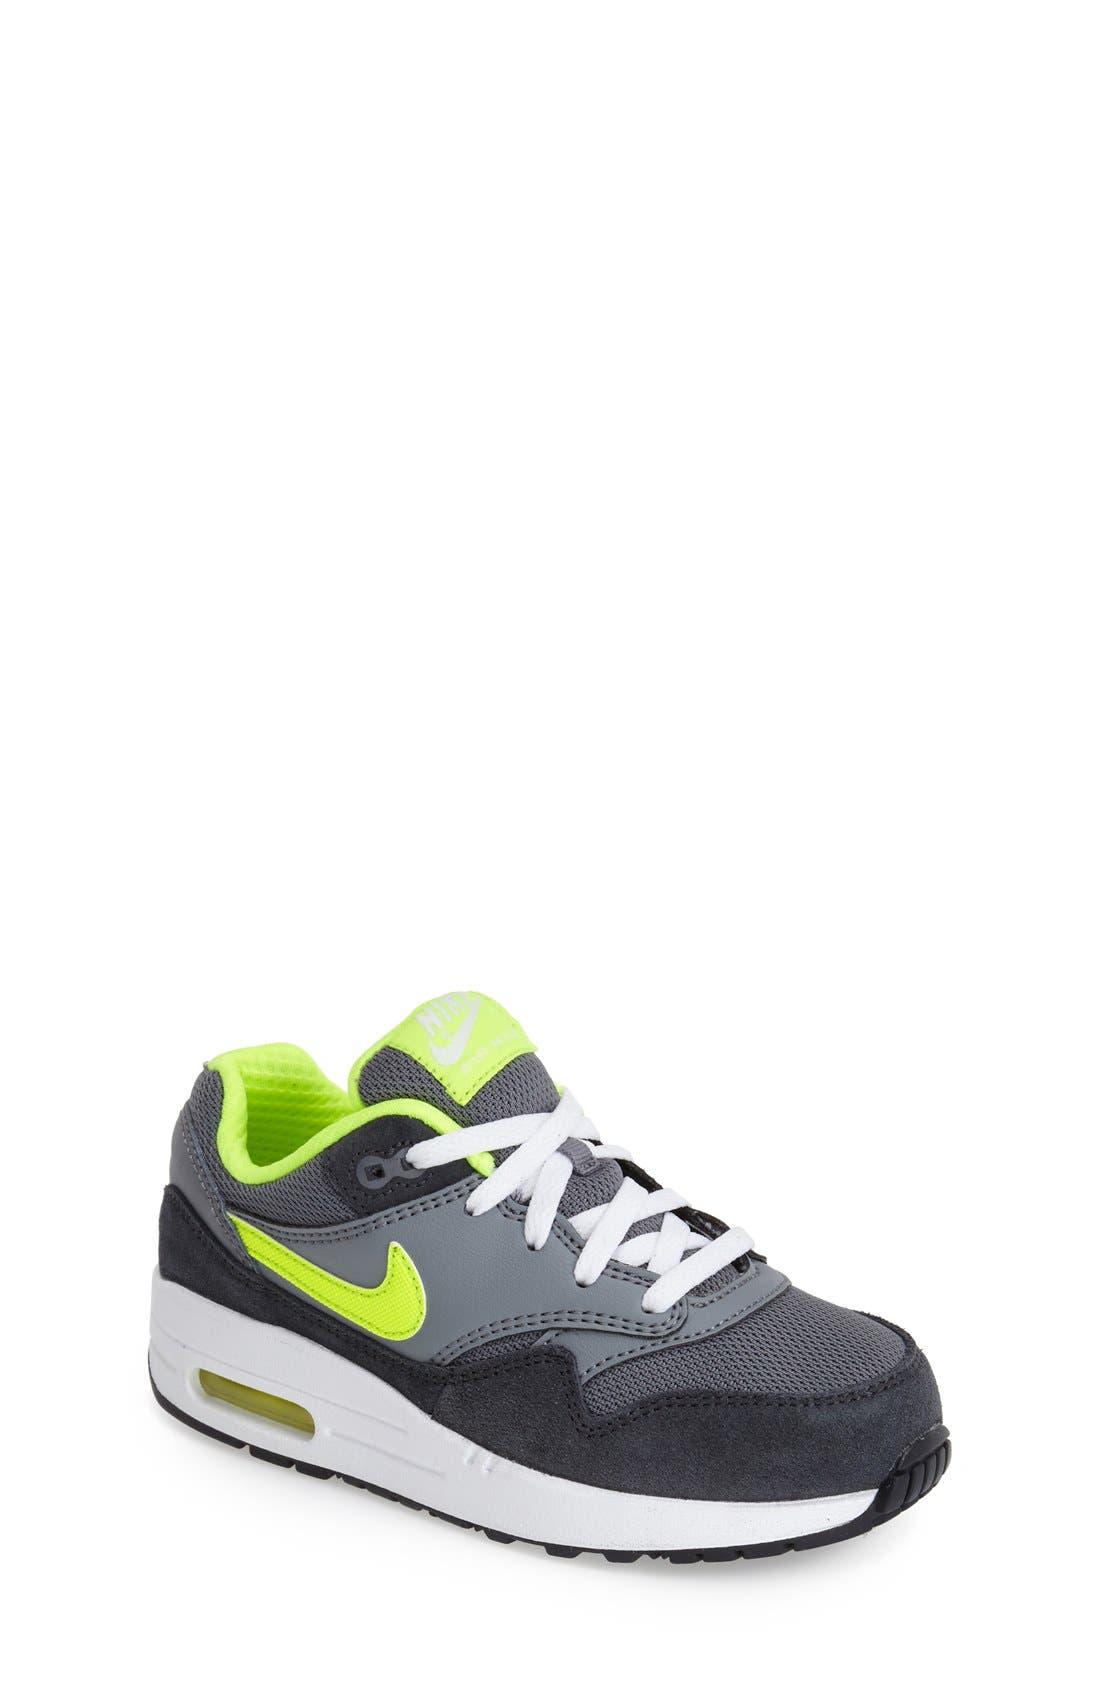 Alternate Image 1 Selected - Nike 'Air Max 1 PS' Sneaker (Toddler & Little Kid)